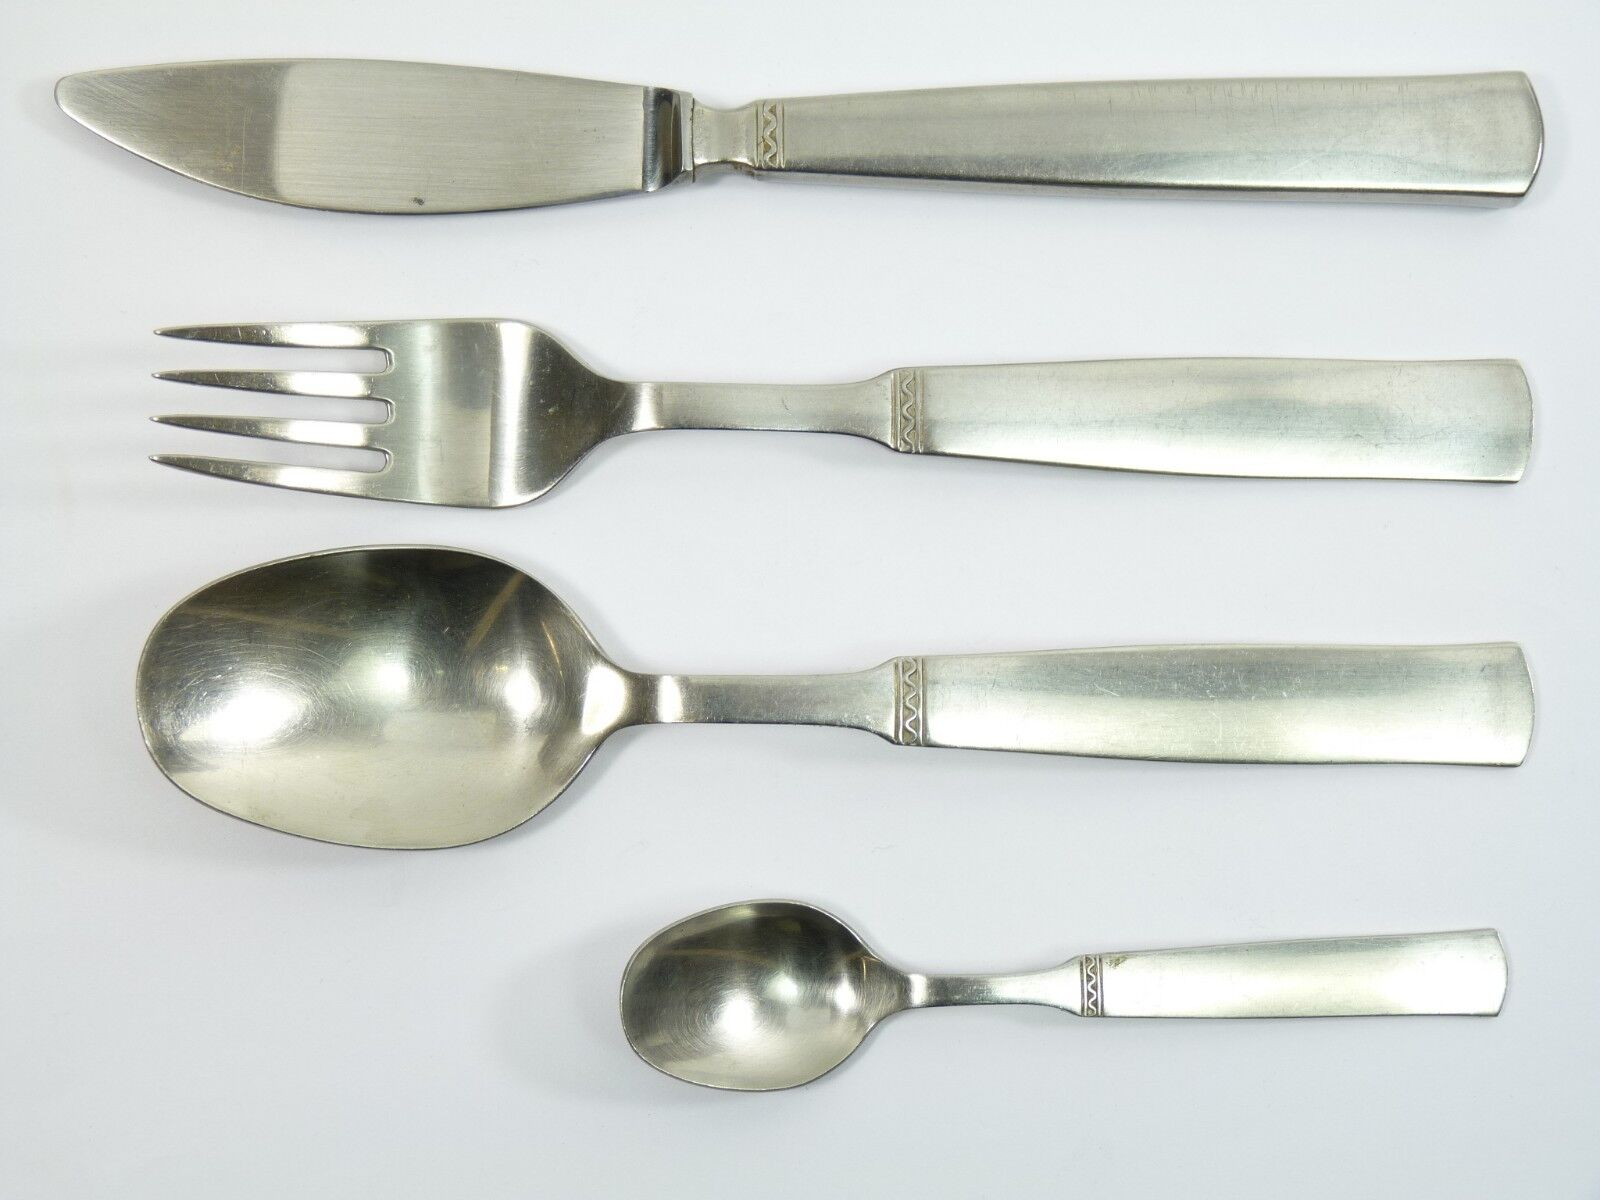 GENSE Cutlery -  RANKA  Design - 4 Piece Set